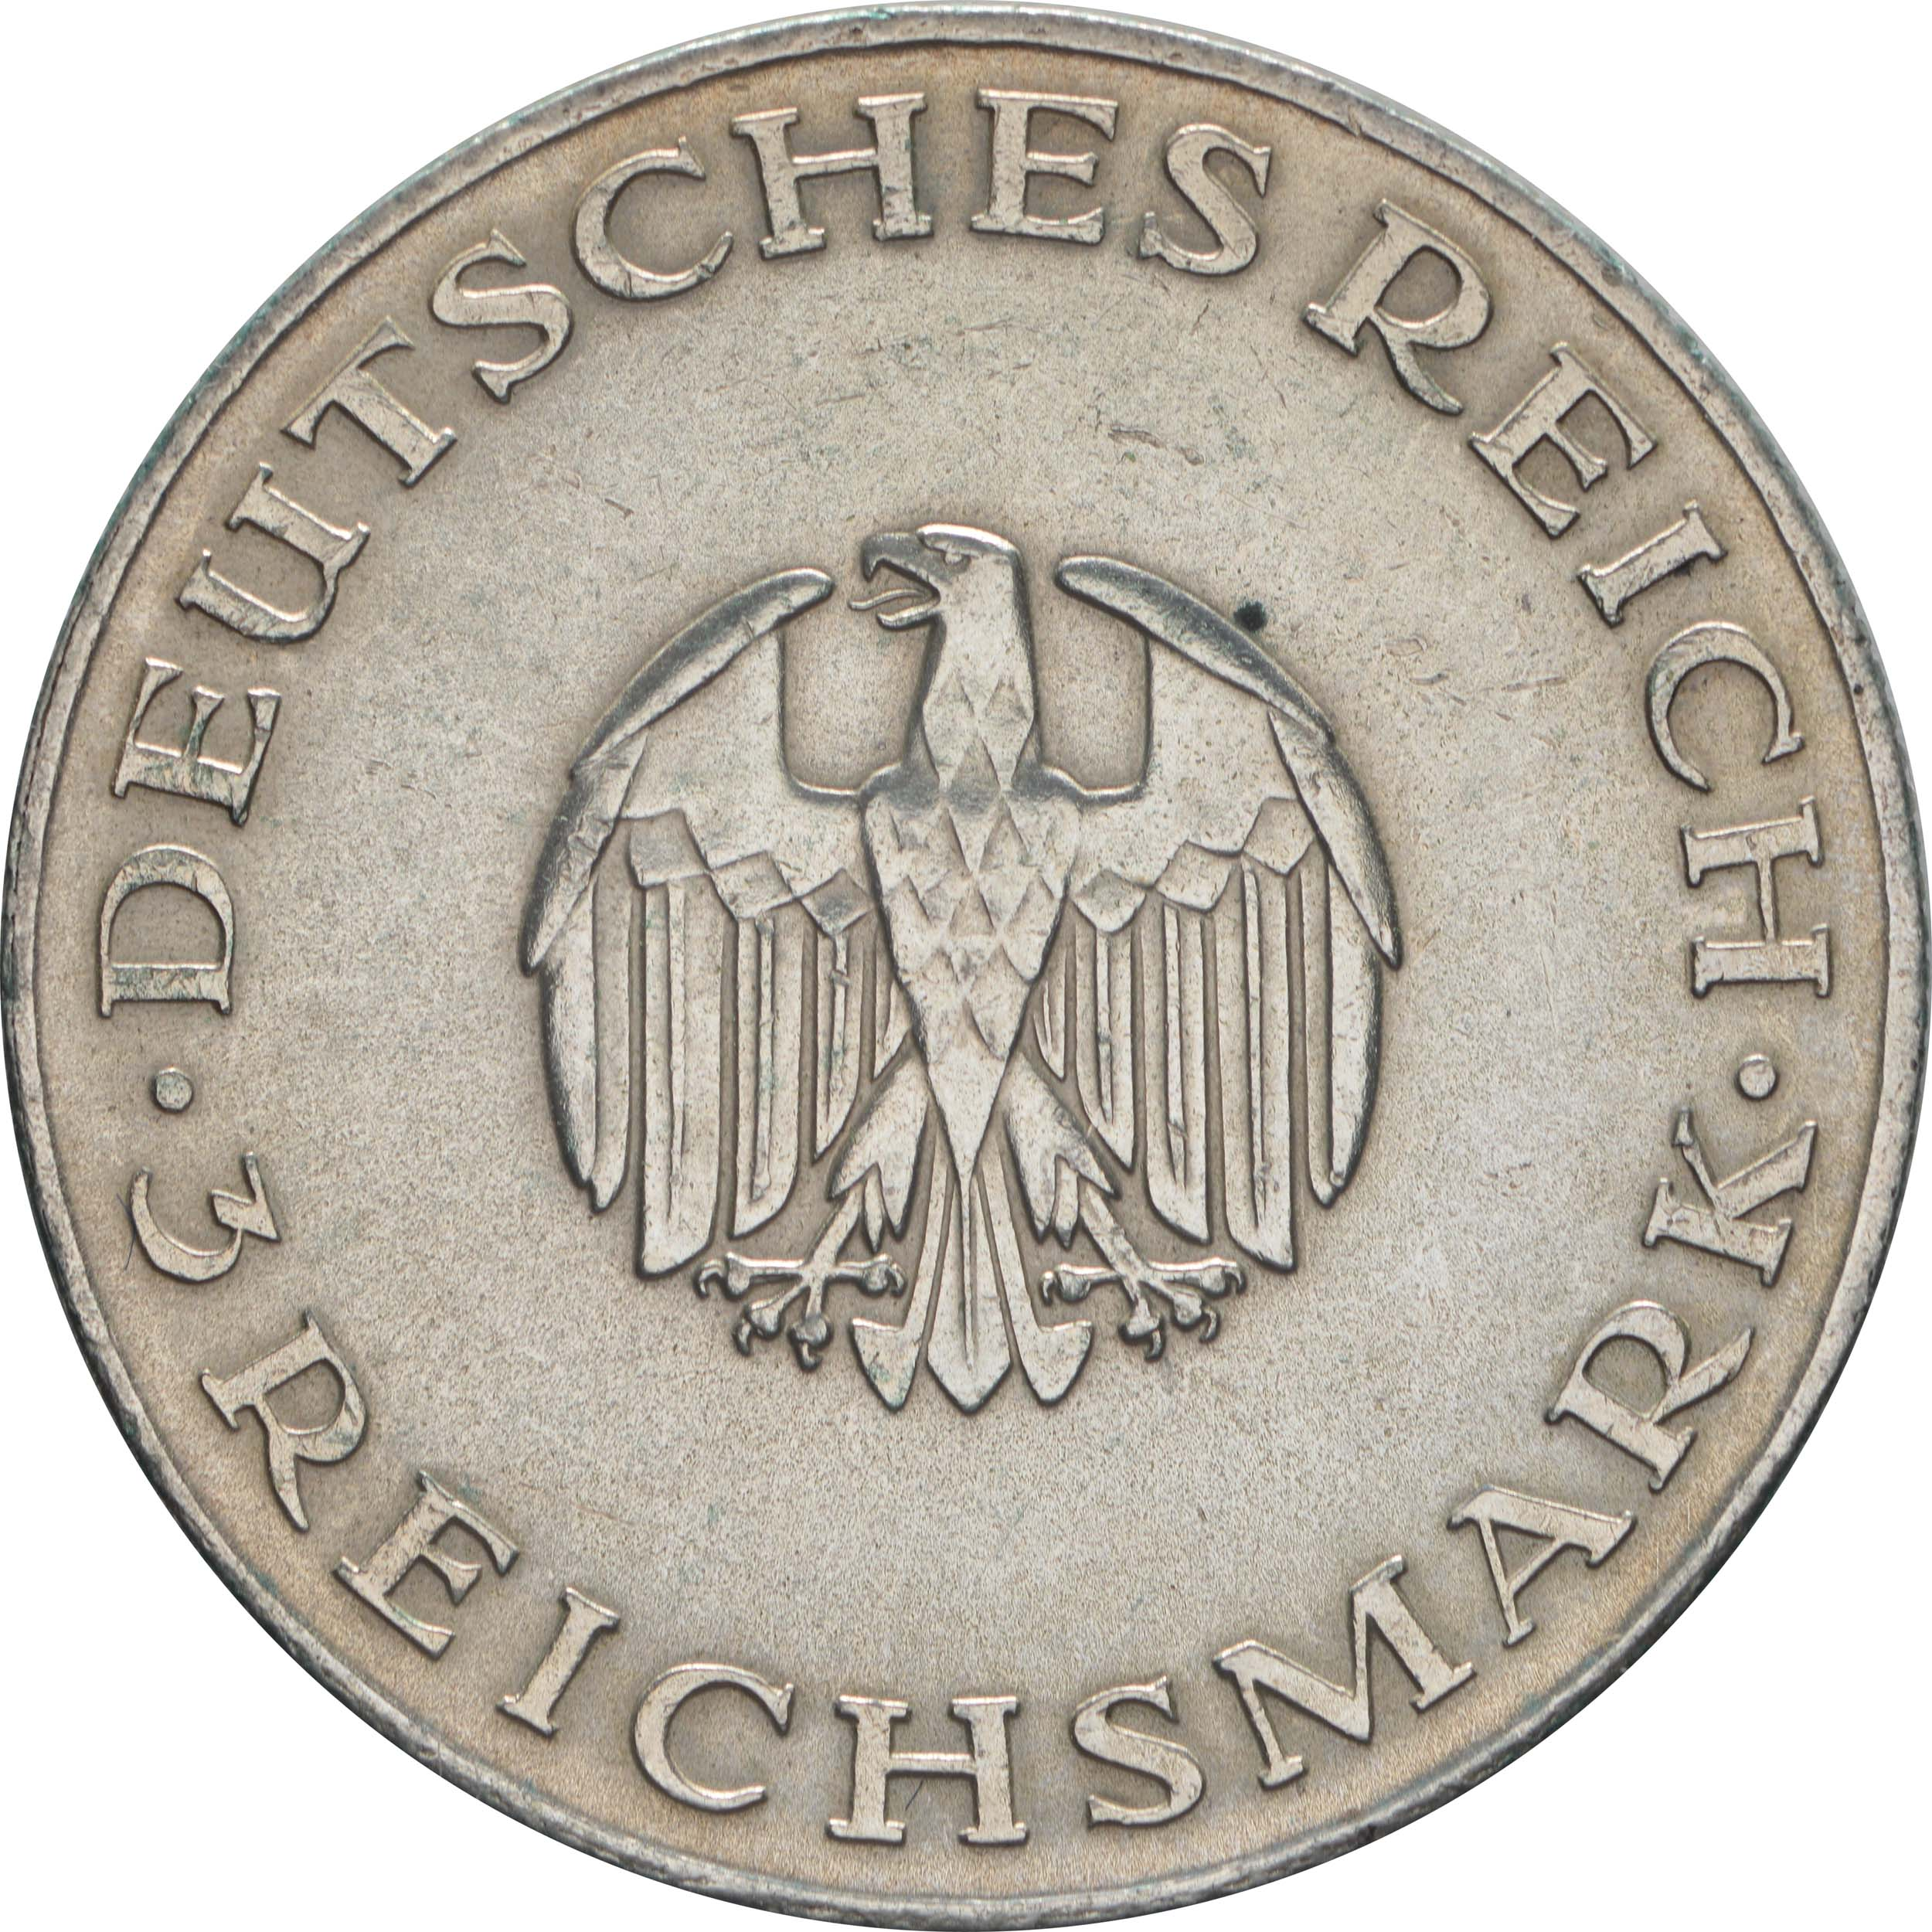 deutschland 3 reichsmark lessing 1929 a silber vz euro. Black Bedroom Furniture Sets. Home Design Ideas